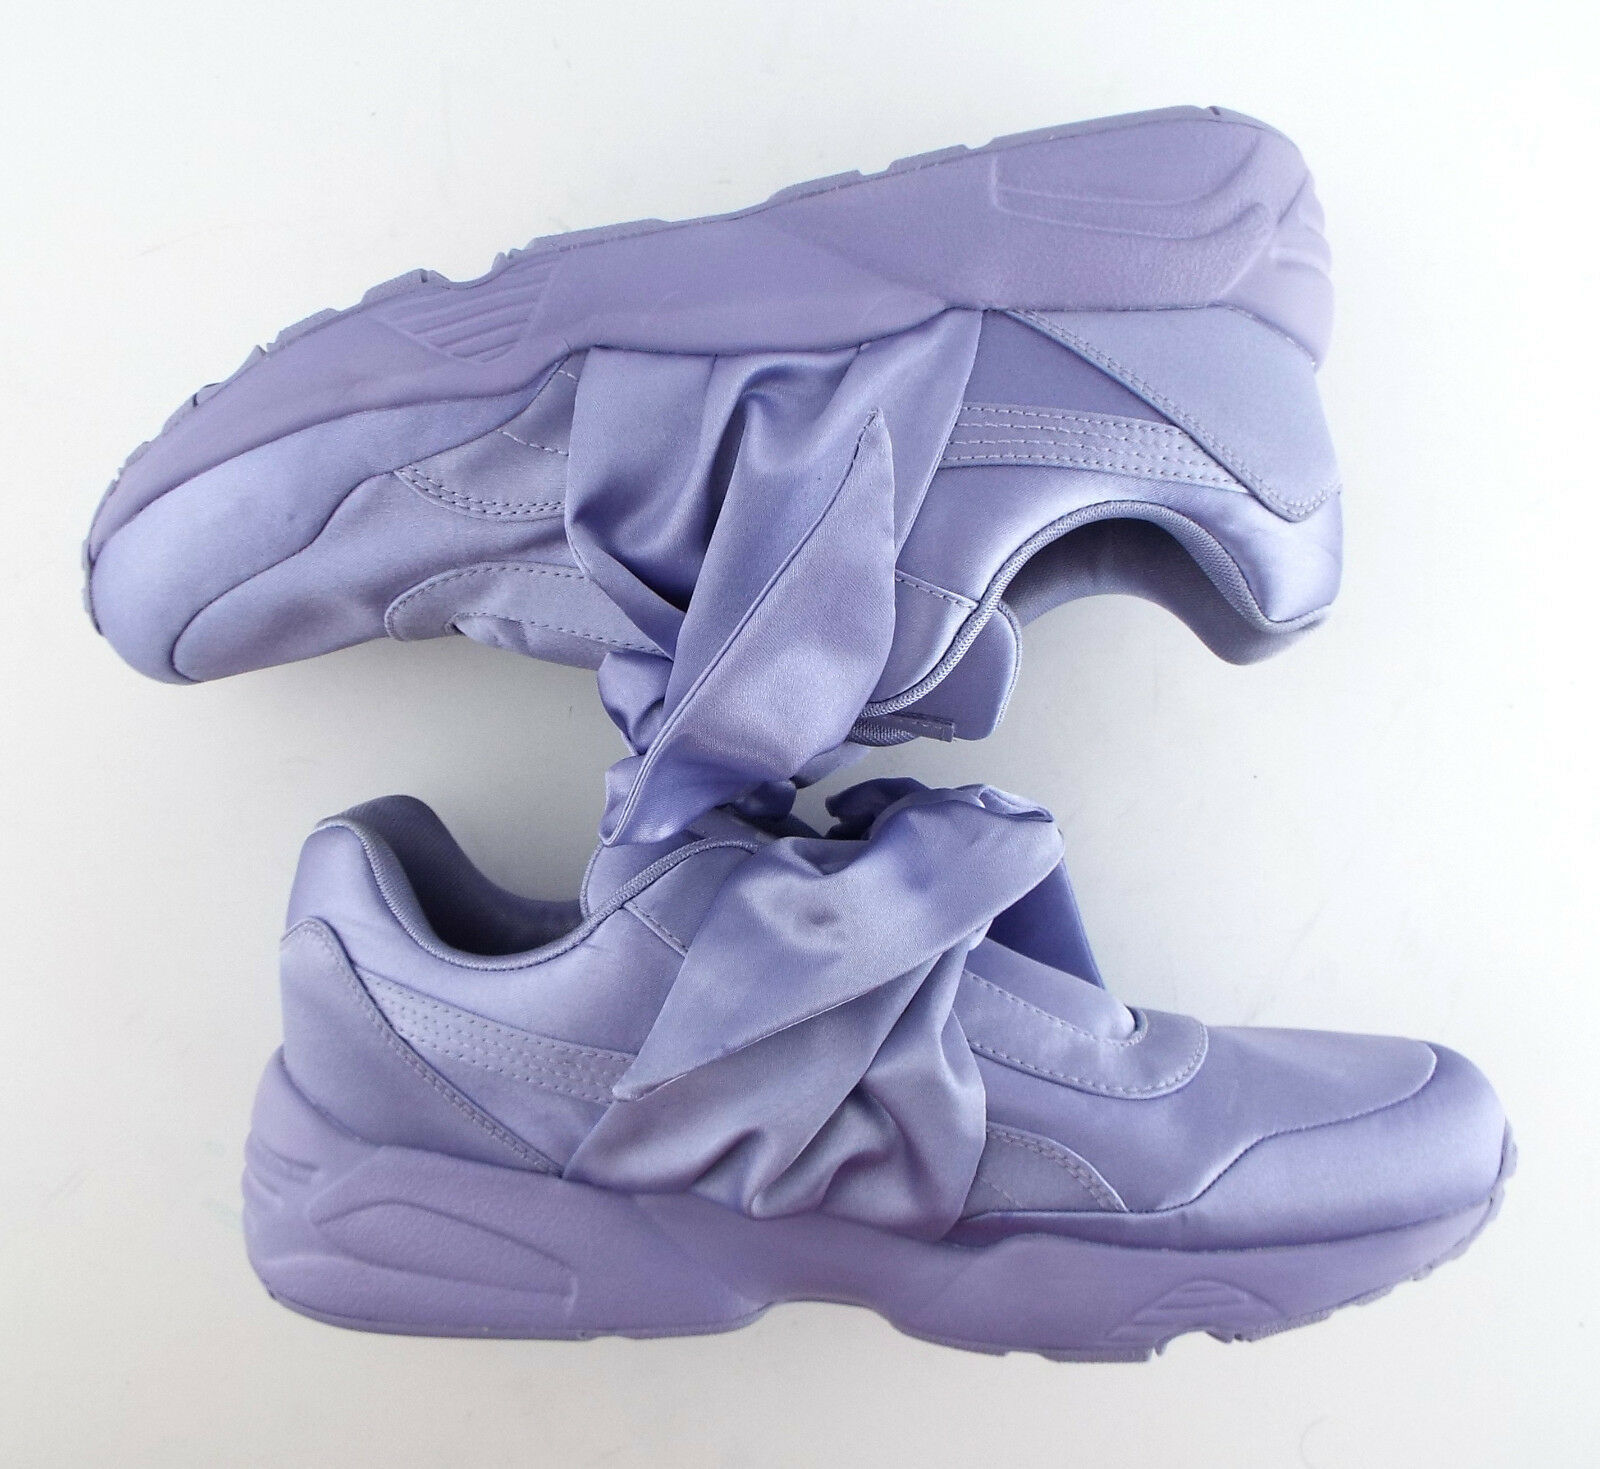 New PUMA RIHANNA Size 9 FENTY Purple Satin Bow Sneakers Shoes image 6